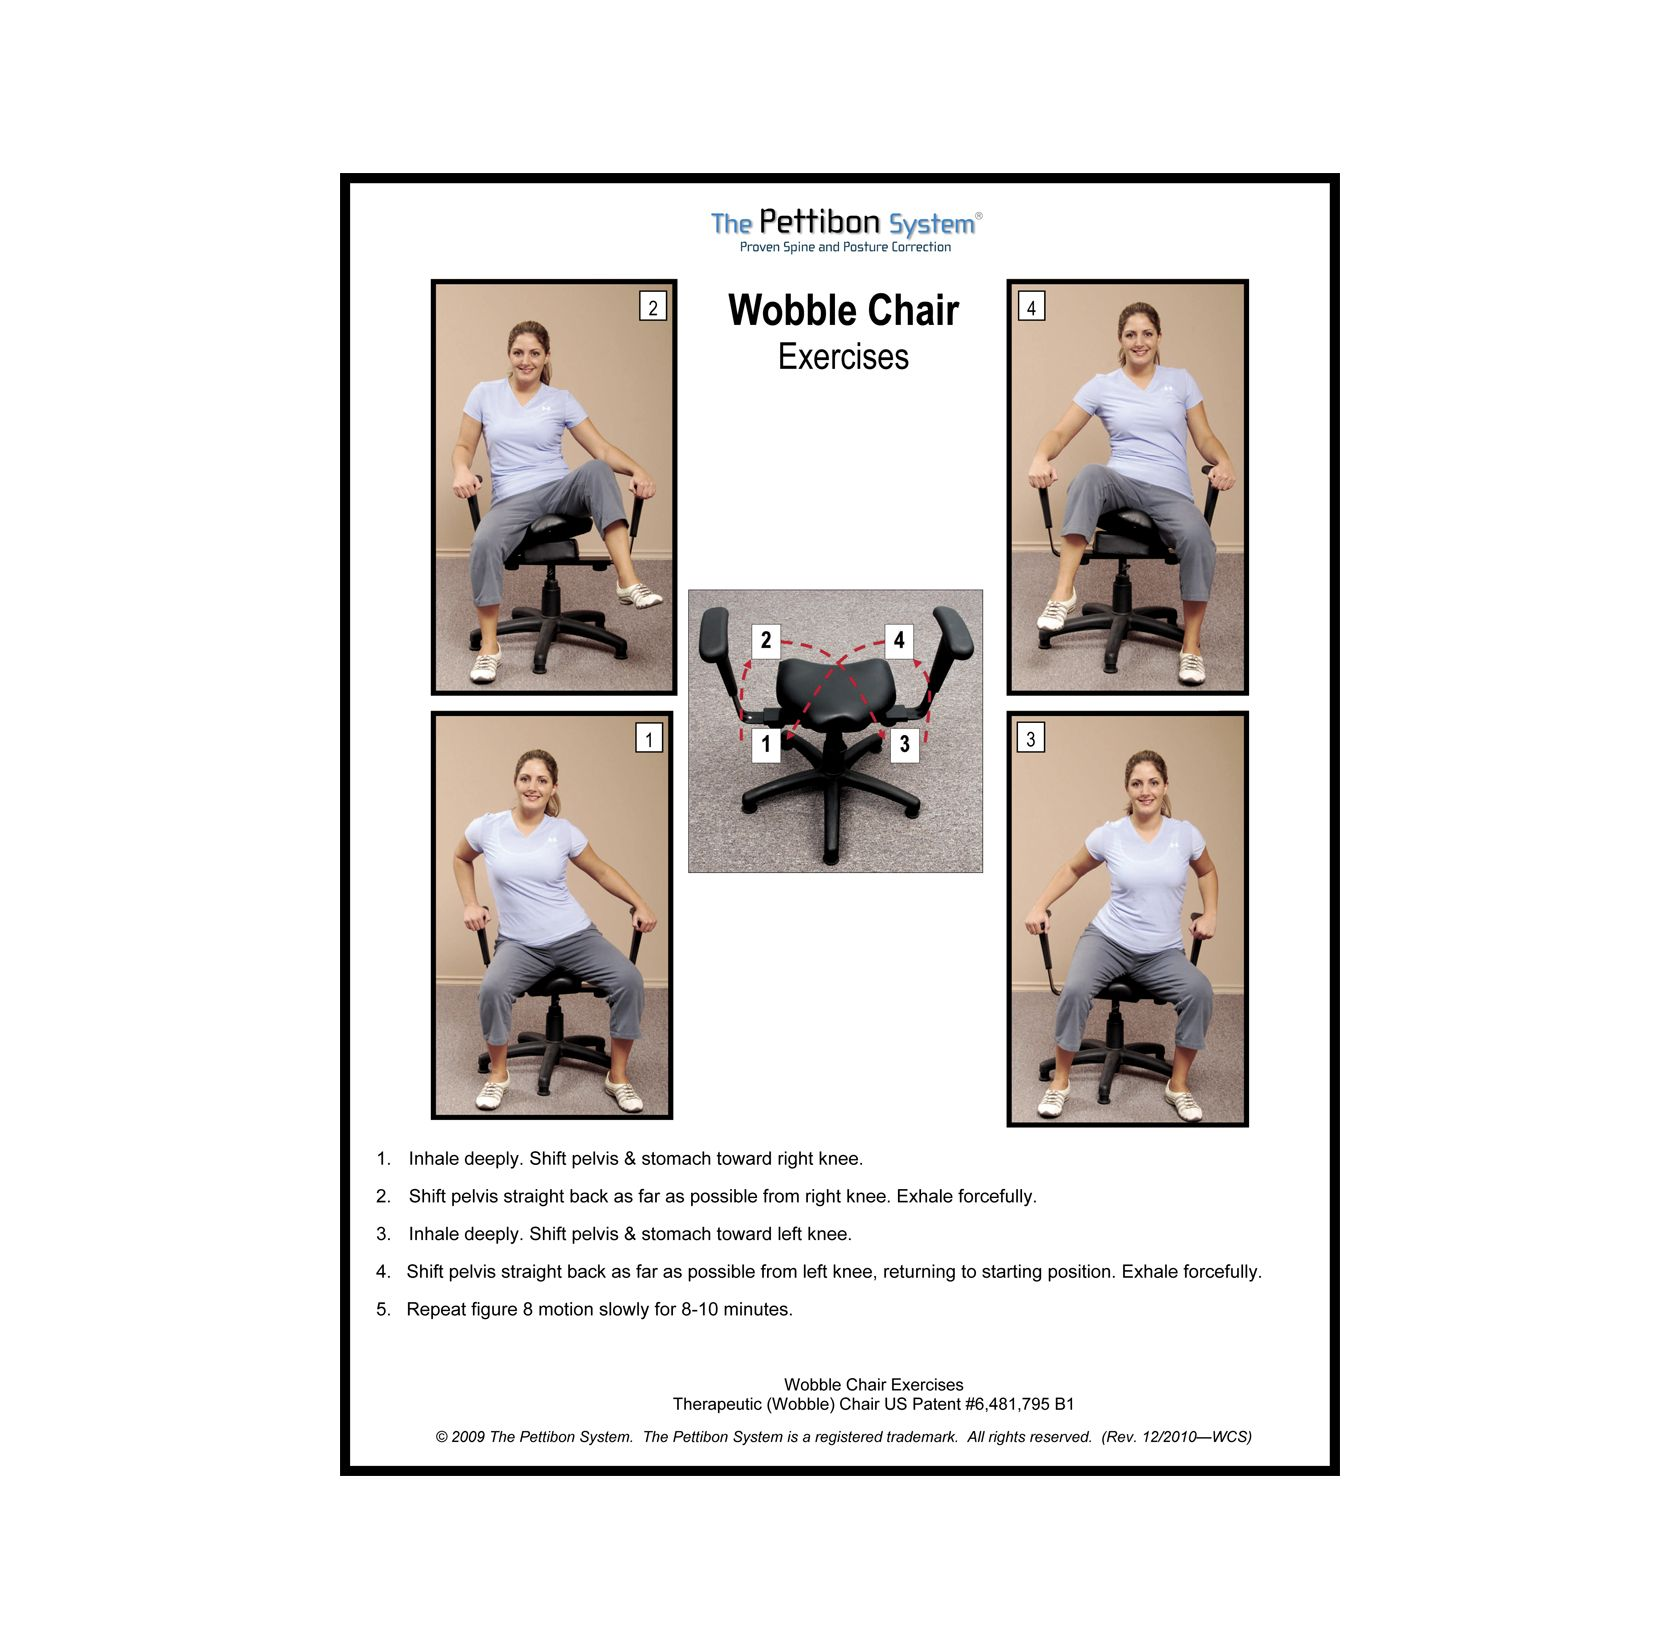 Pettibon Wobble Chair Plastic Covers Target Google Search Sugar Hill Spine